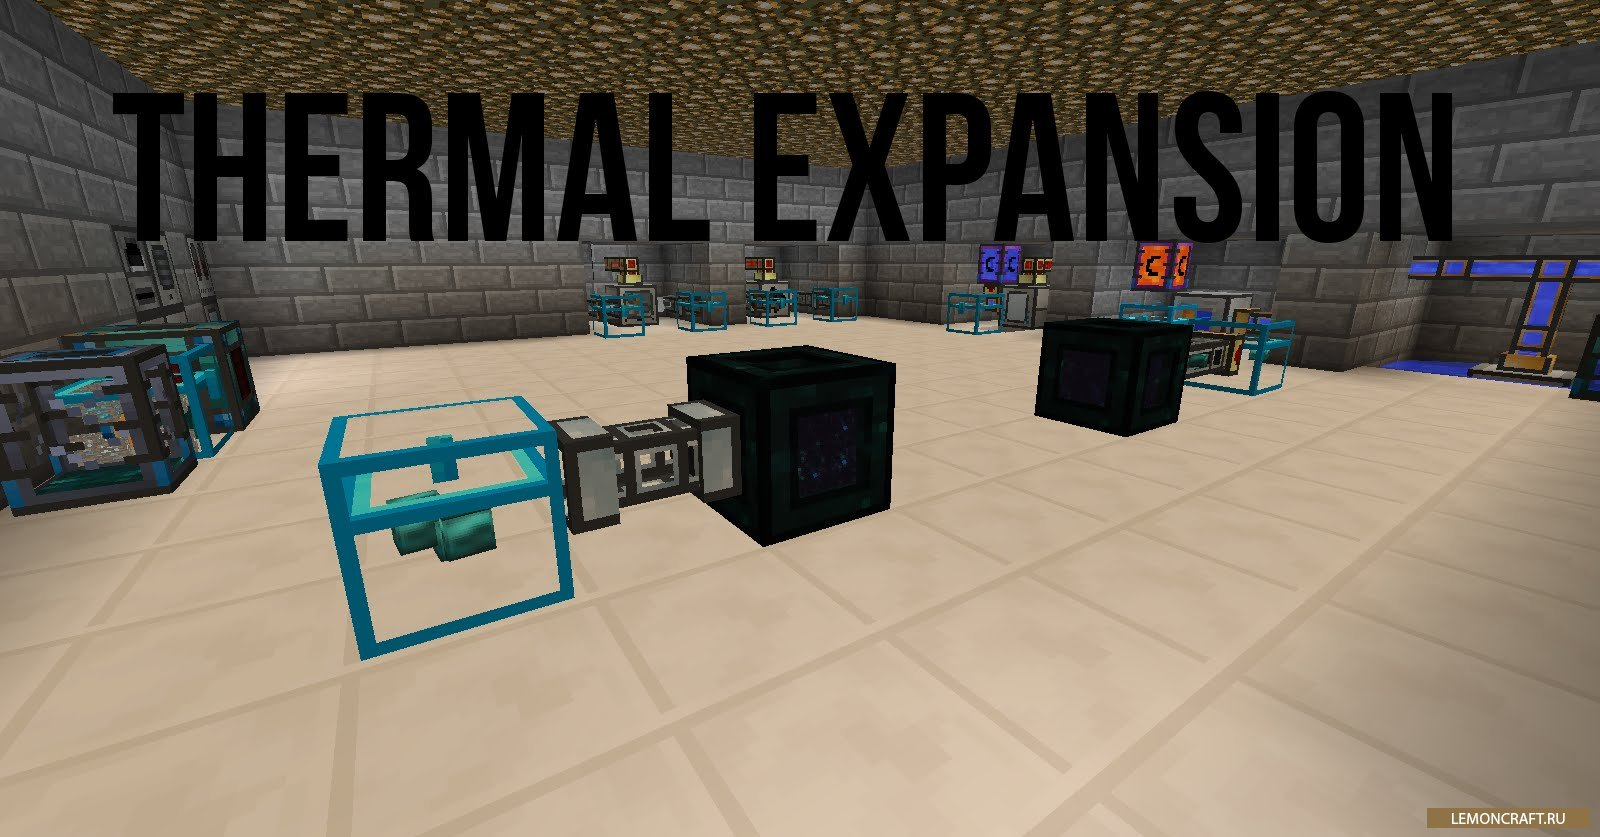 Мод на автоматизацию сбора и хранения ресурсов Thermal Expansion [1.12.2] [1.11.2] [1.10.2] [1.7.10]